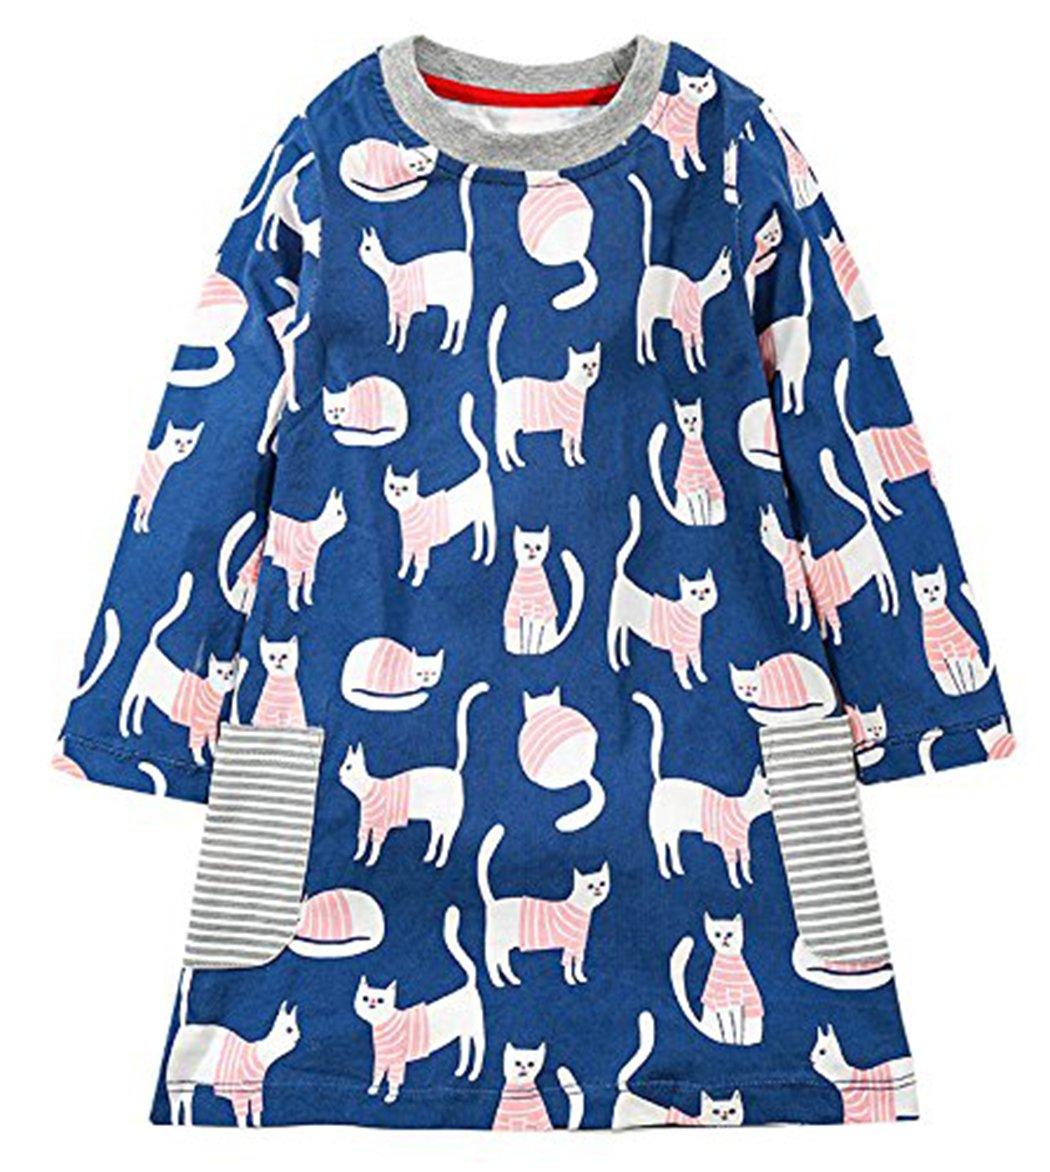 lymanchi Little Girl Long Sleeve Cute Cotton Animal Casual Striped T-Shirt Dress 909347 5